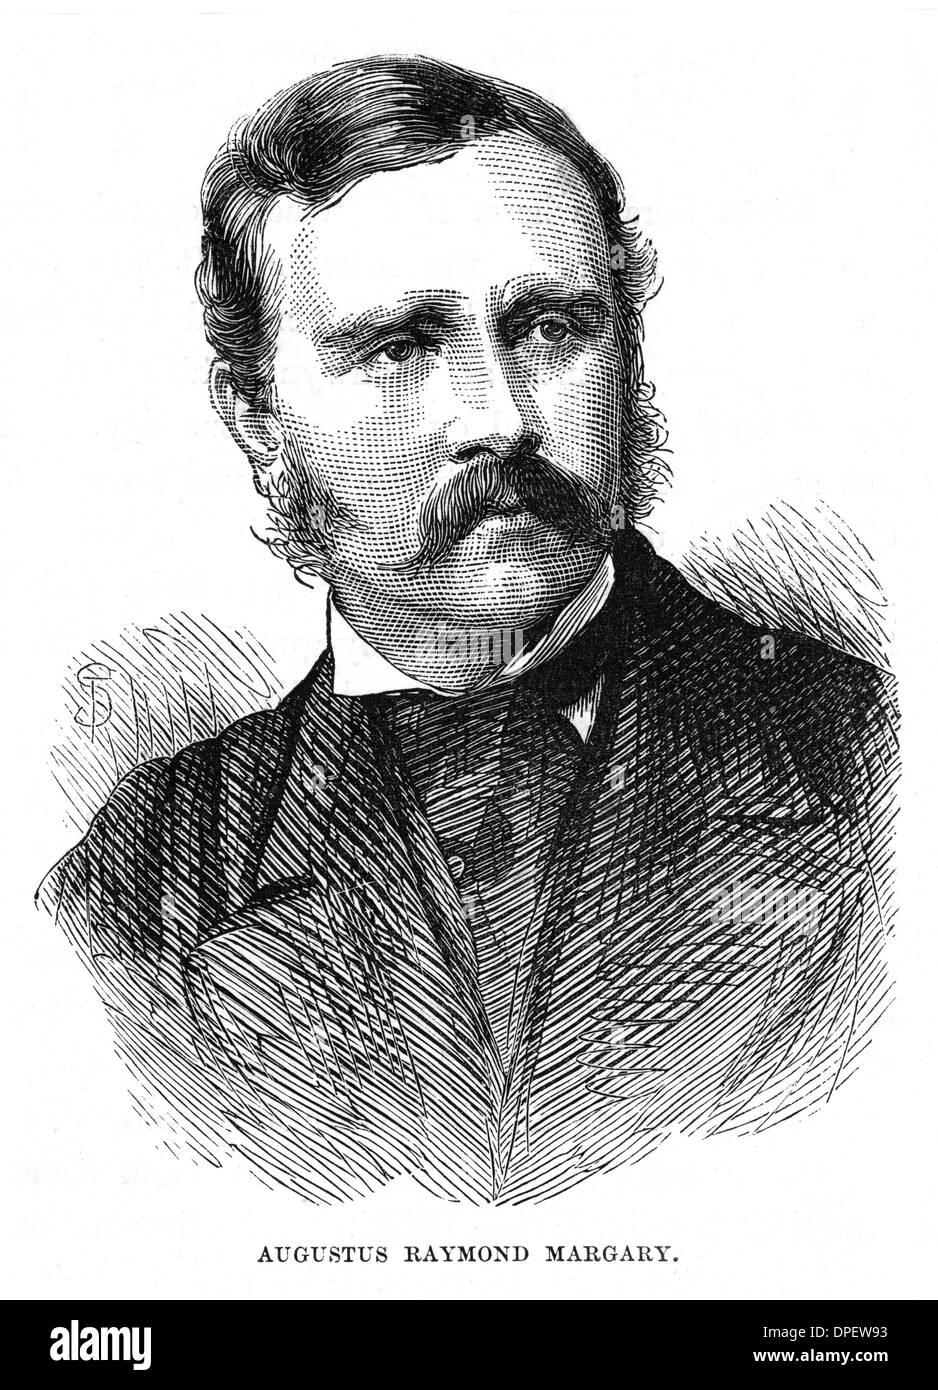 AUGUSTUS RAYMOND MARGARY - Stock Image